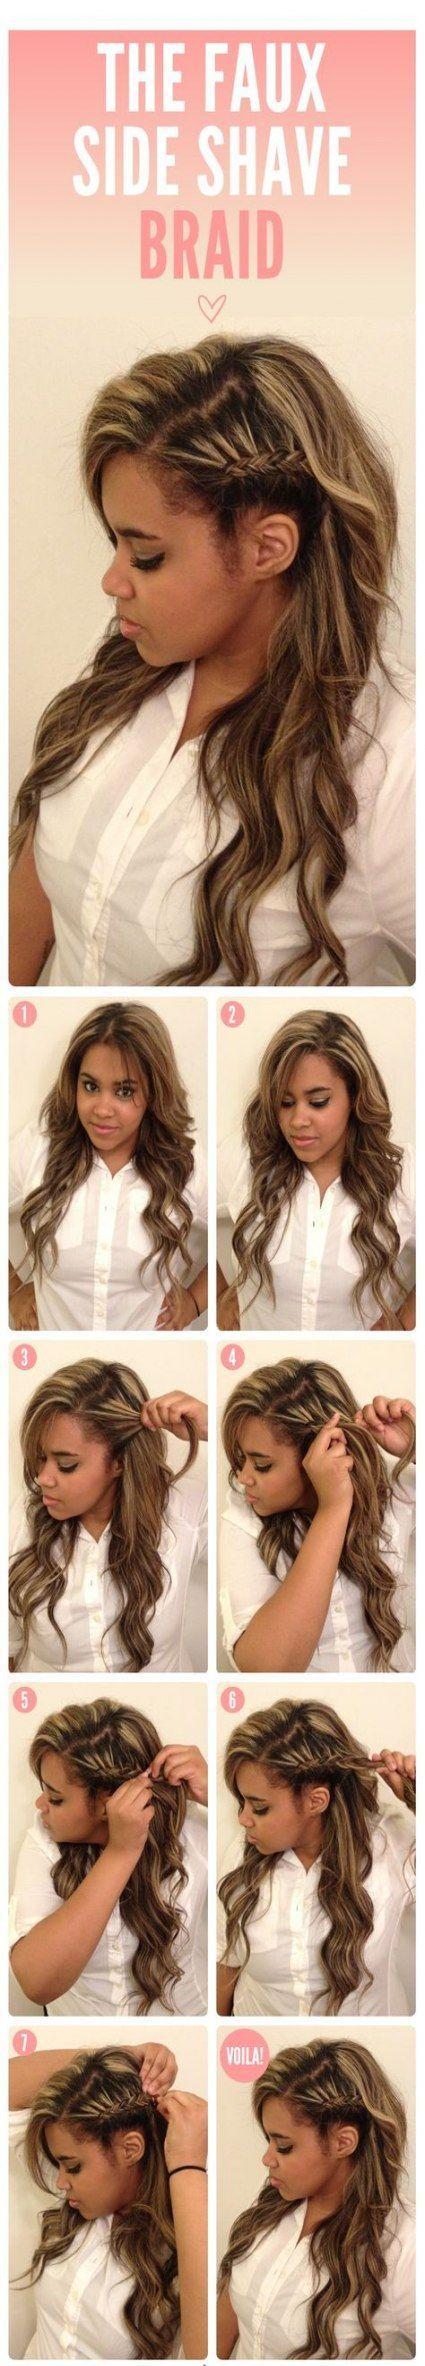 17+ best Ideas for hair straight wedding side braids,  #beautifulhairstylesforweddingsidebrai...